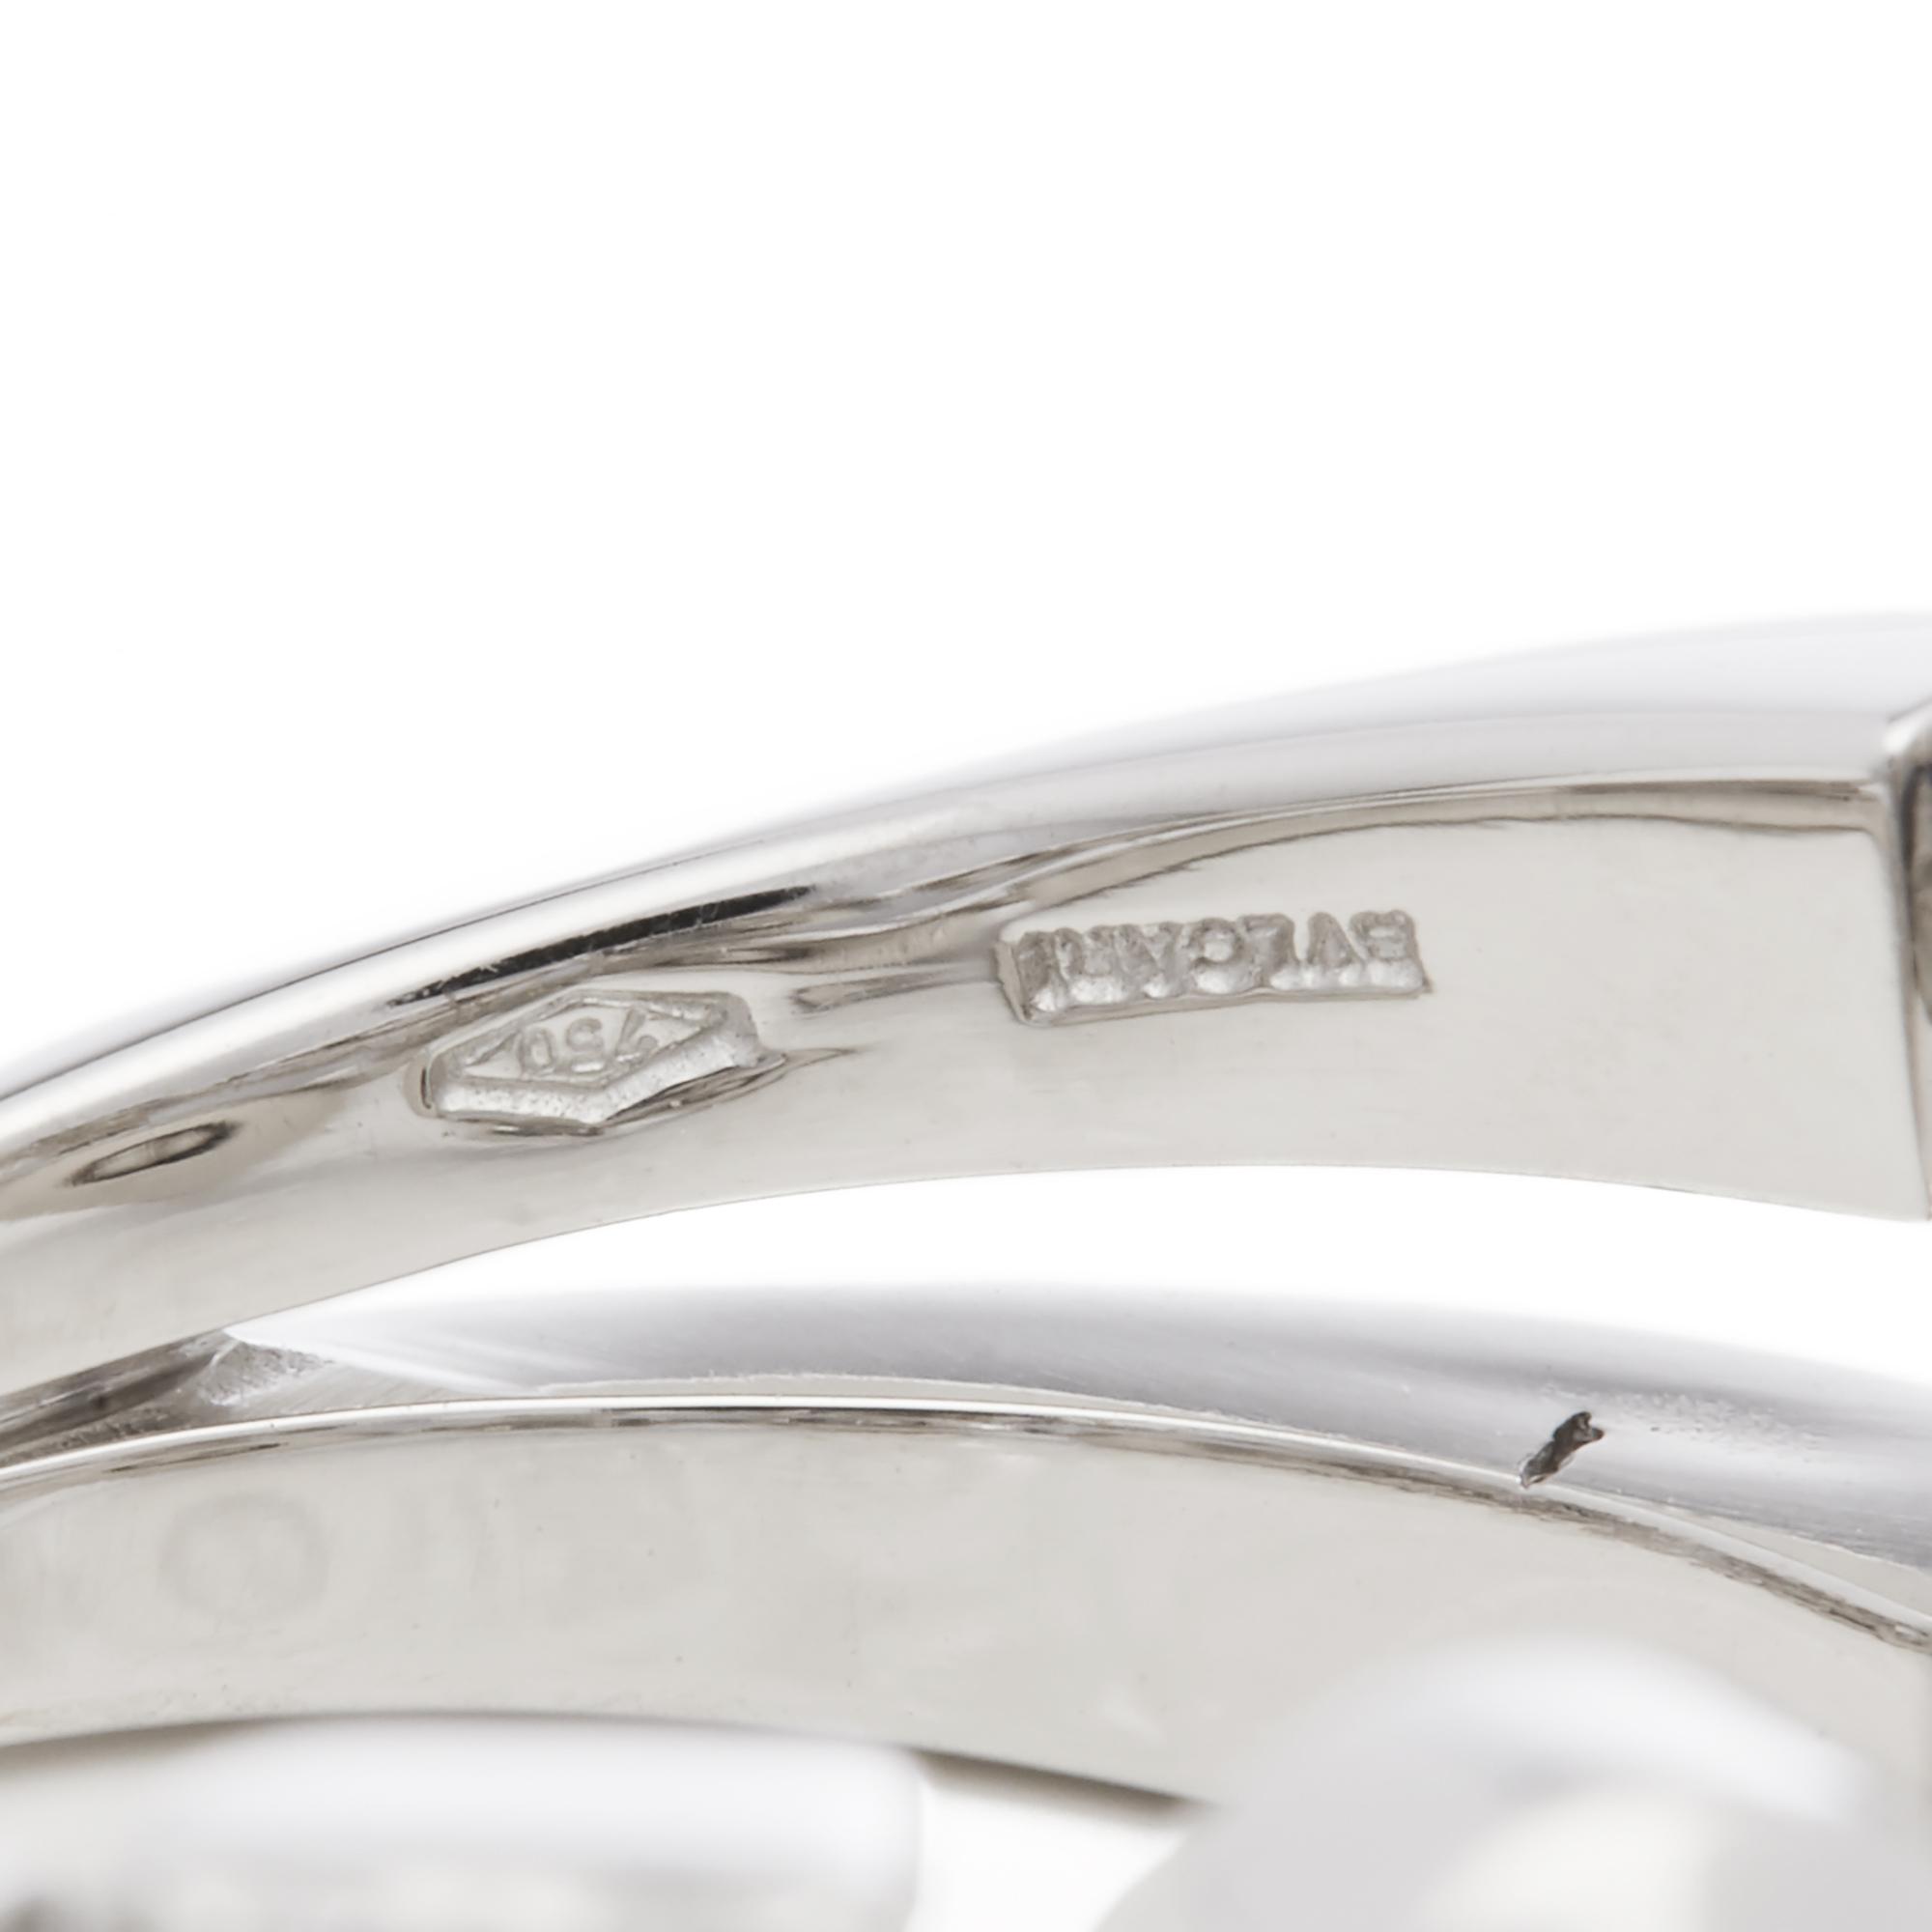 Bulgari 18ct White Gold Lucéa Diamond Ring - Image 3 of 7